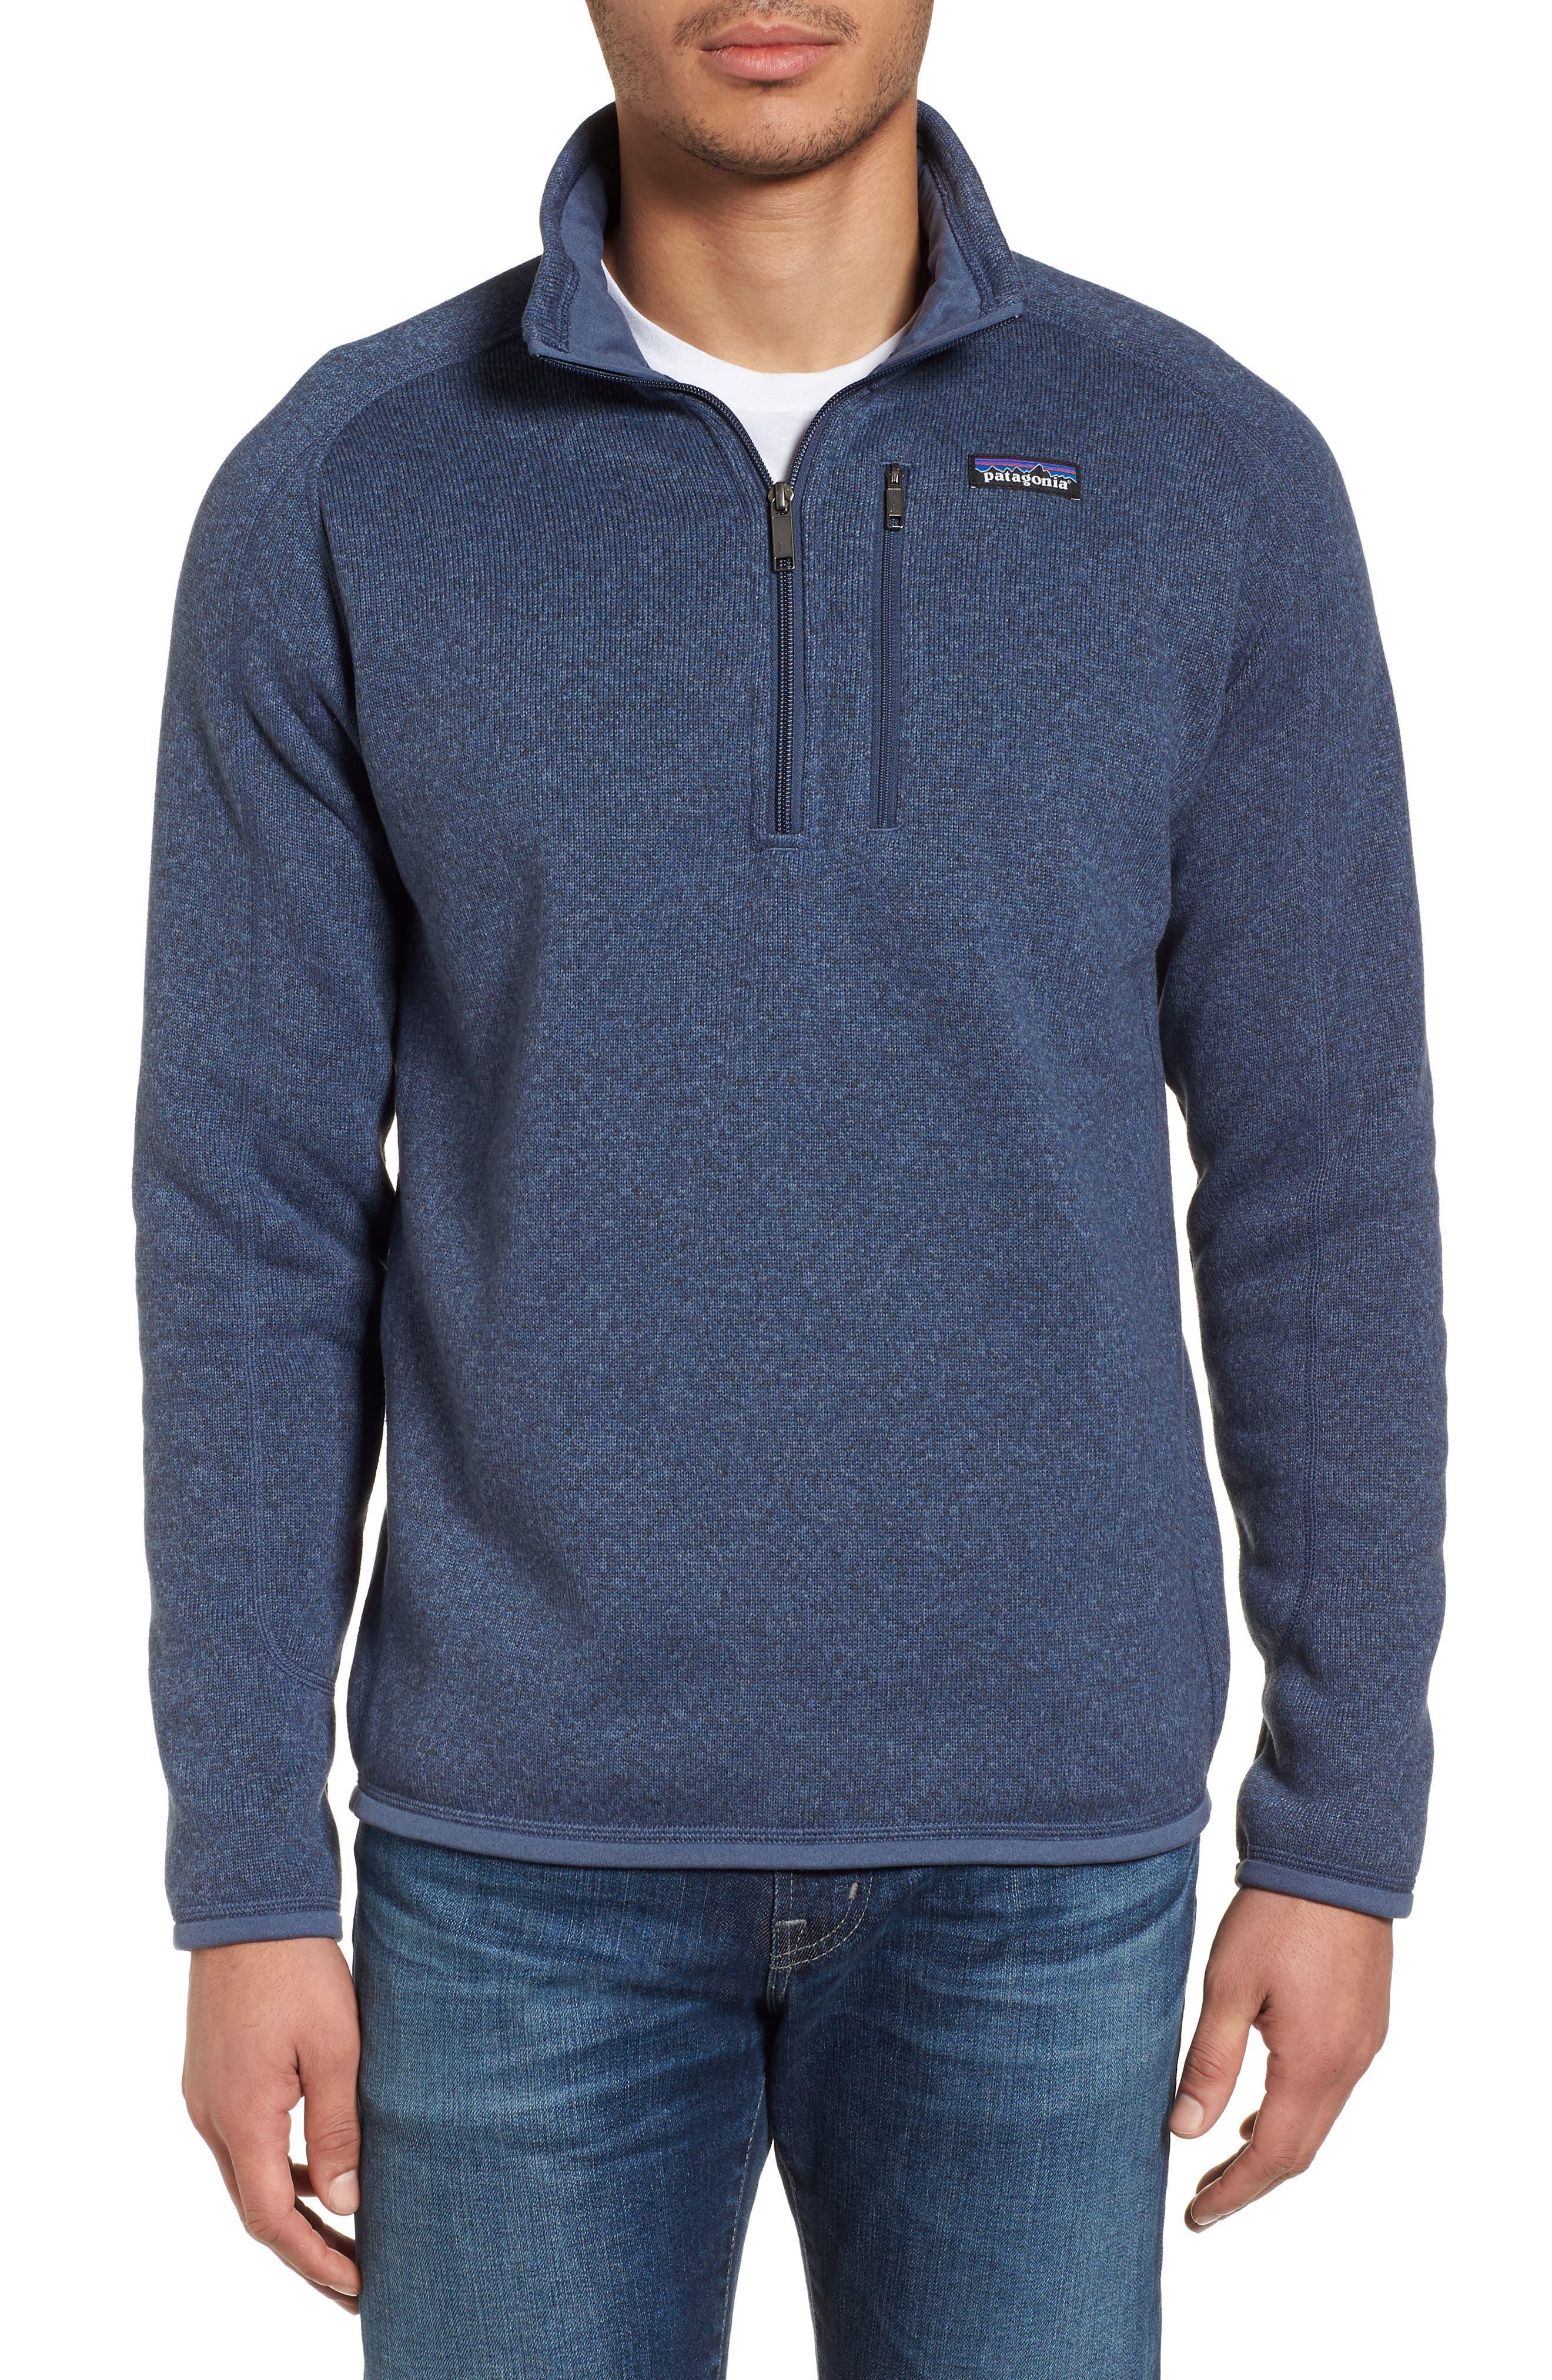 Better Sweater Quarter Zip Pullover, Main, color, DOLOMITE BLUE